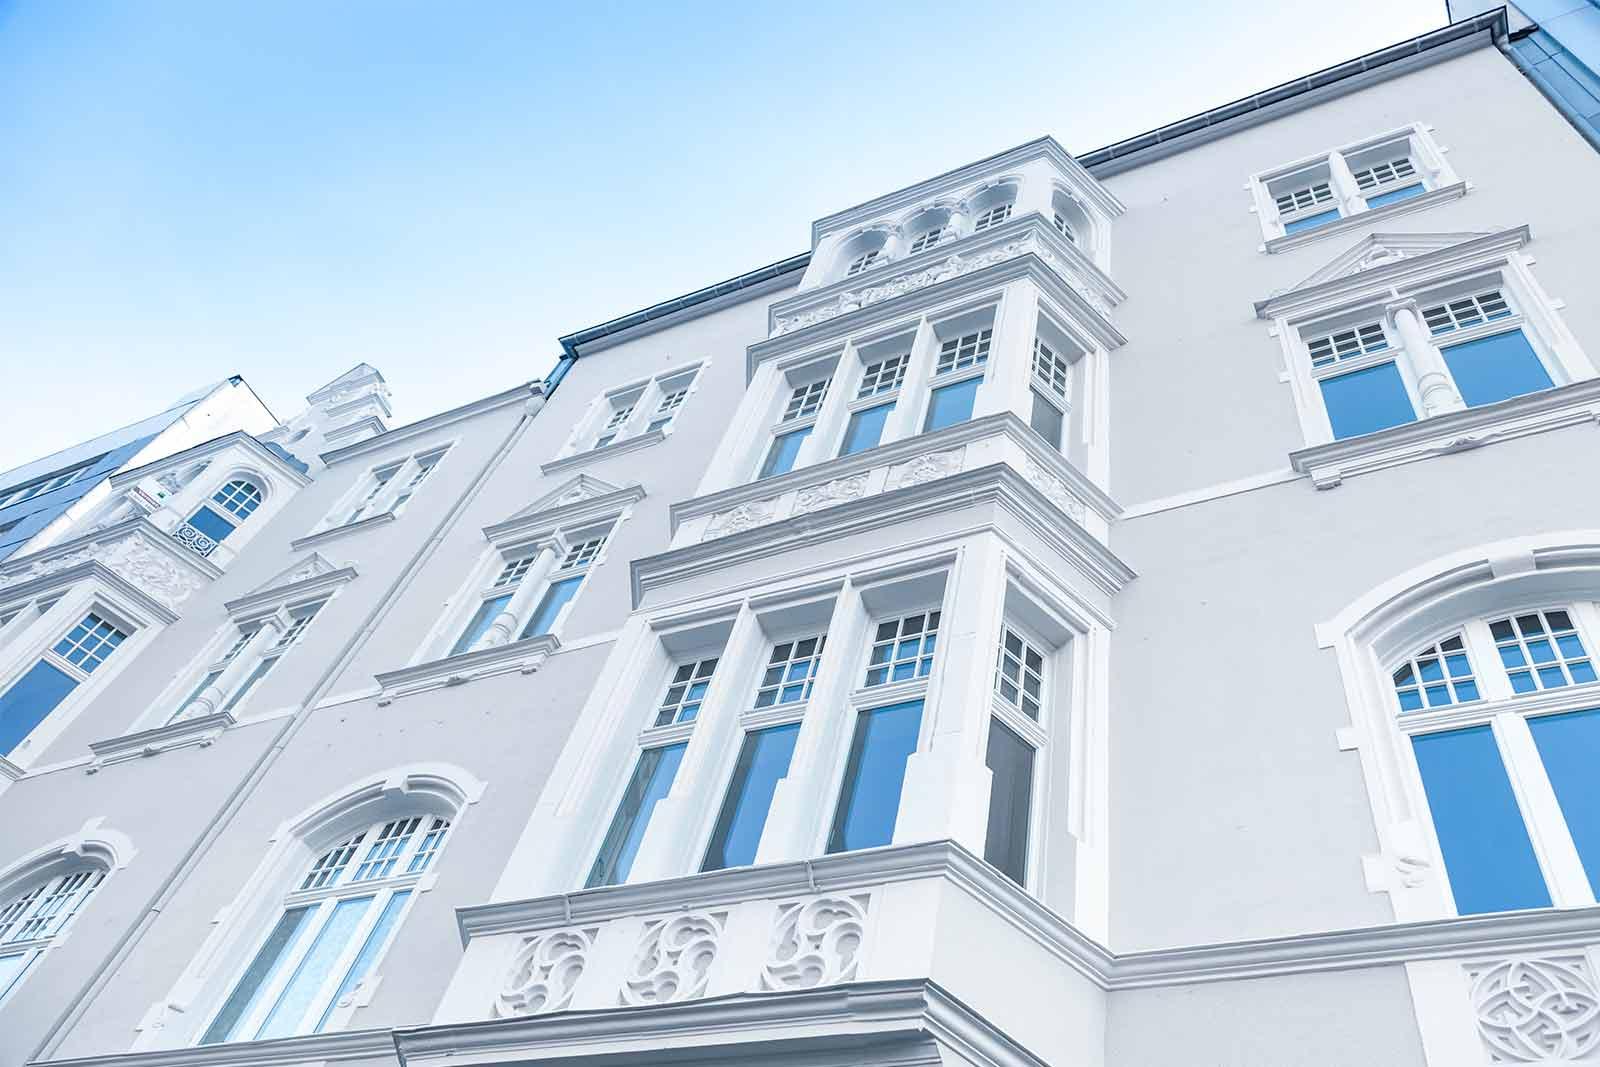 Merz Immobilien Villingen Schwenningen Verkaufen